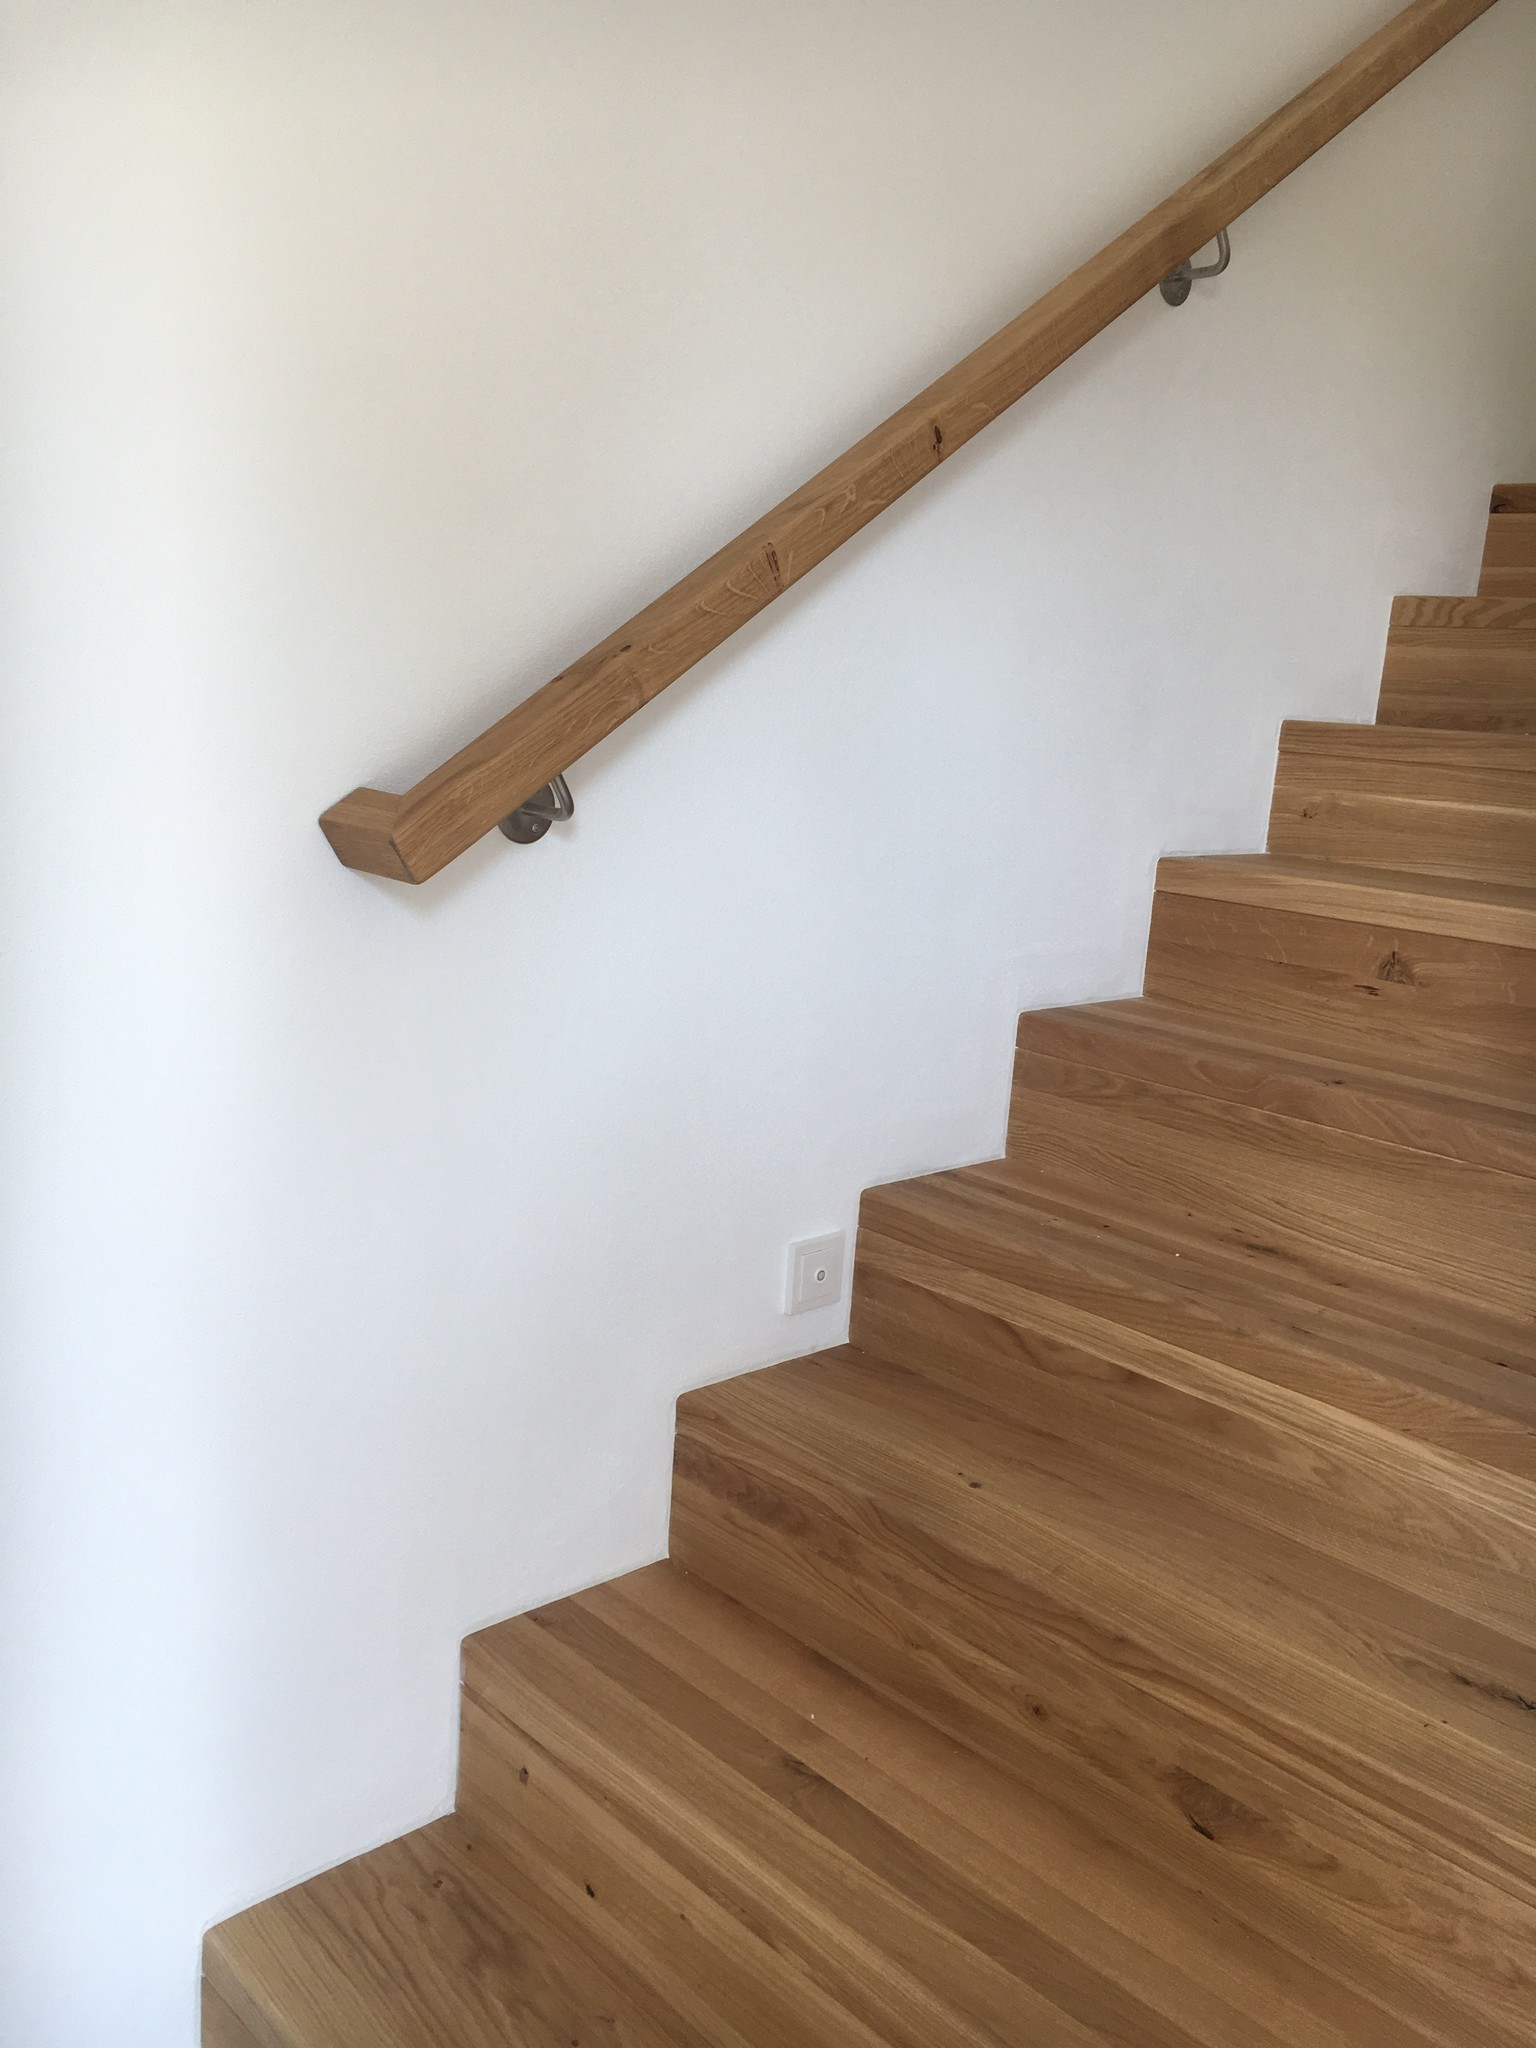 occy Beleuchtungssteuerung Treppenlicht